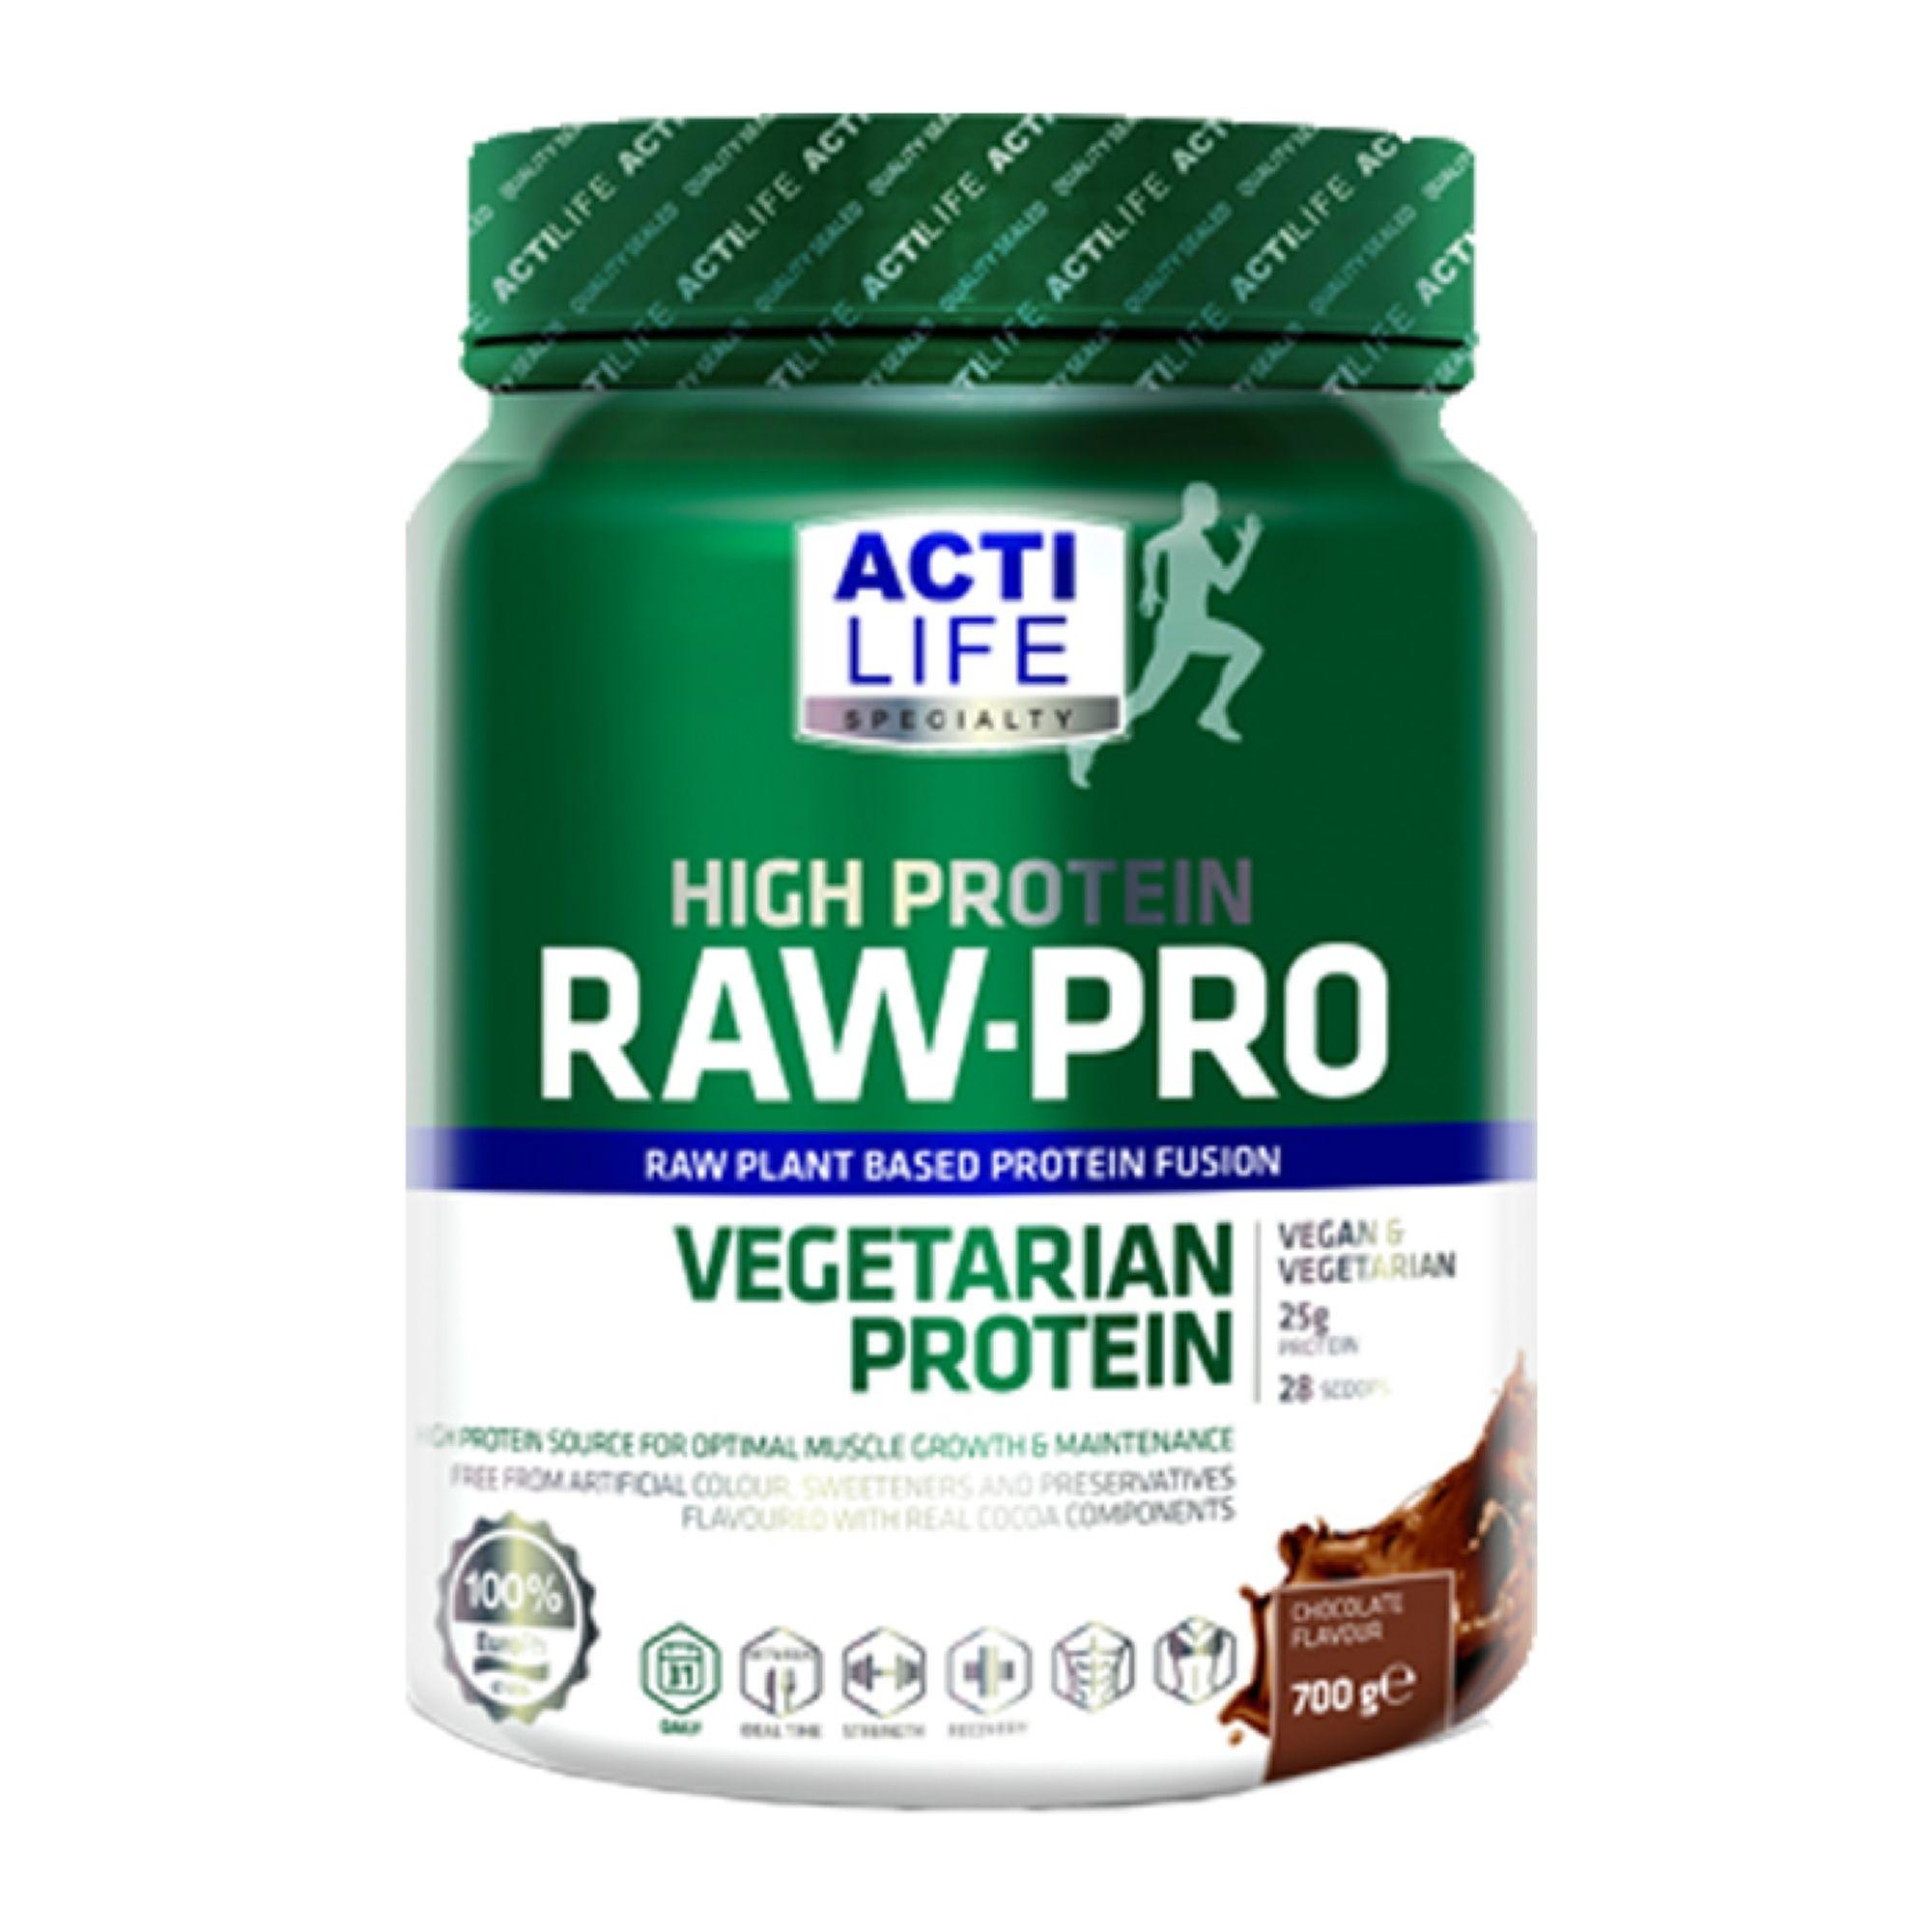 USN RawPro Vegetarian Protein USN (Ultimate Sports